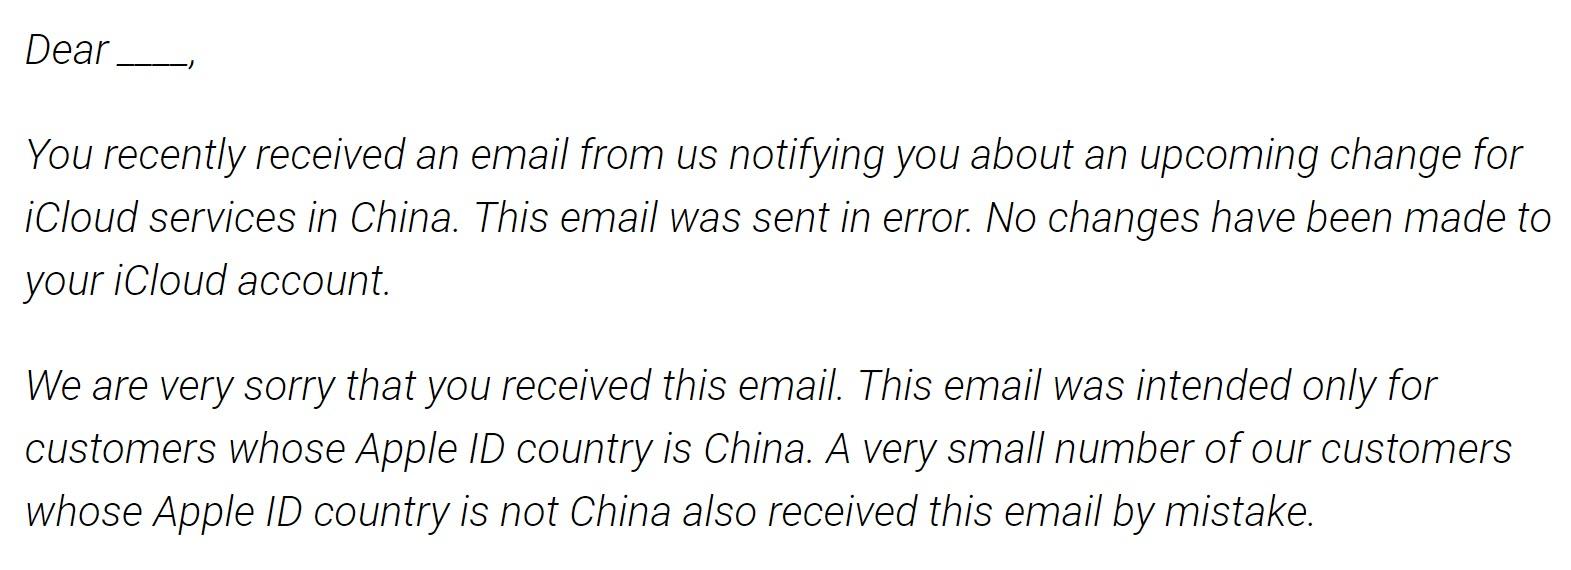 Apple Said Icloud Migration To China Error 1